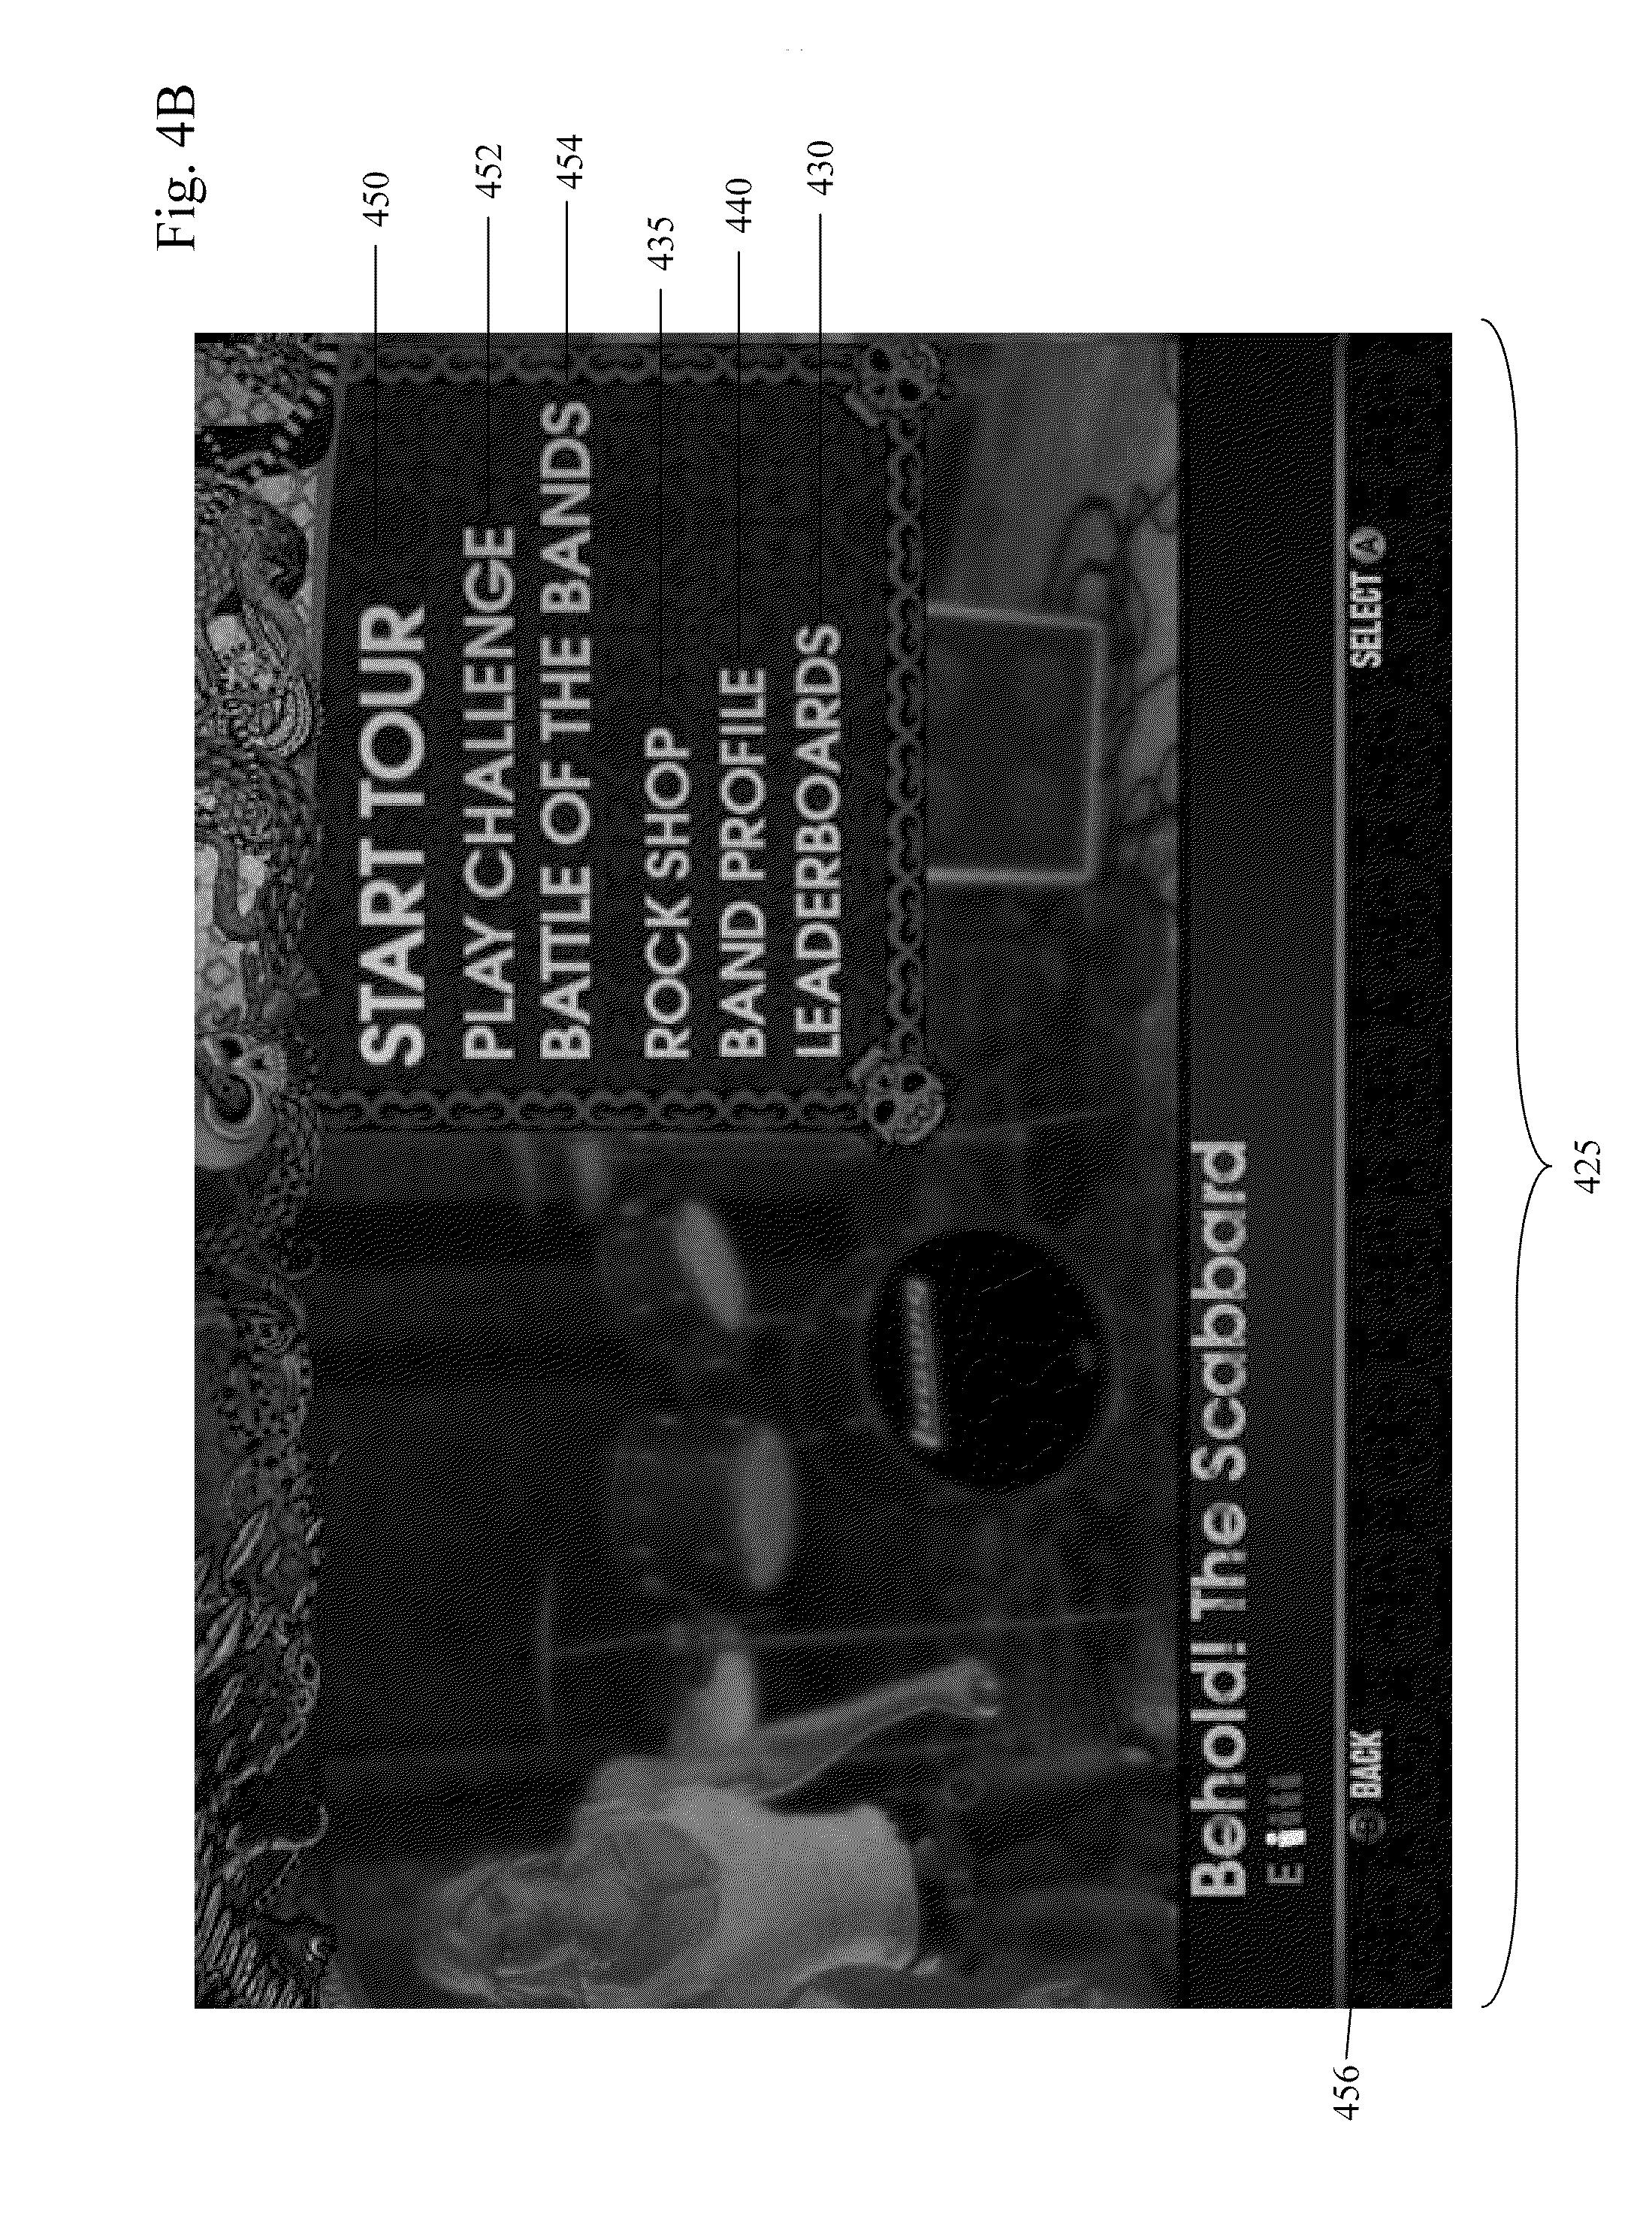 Patent US 8,678,896 B2